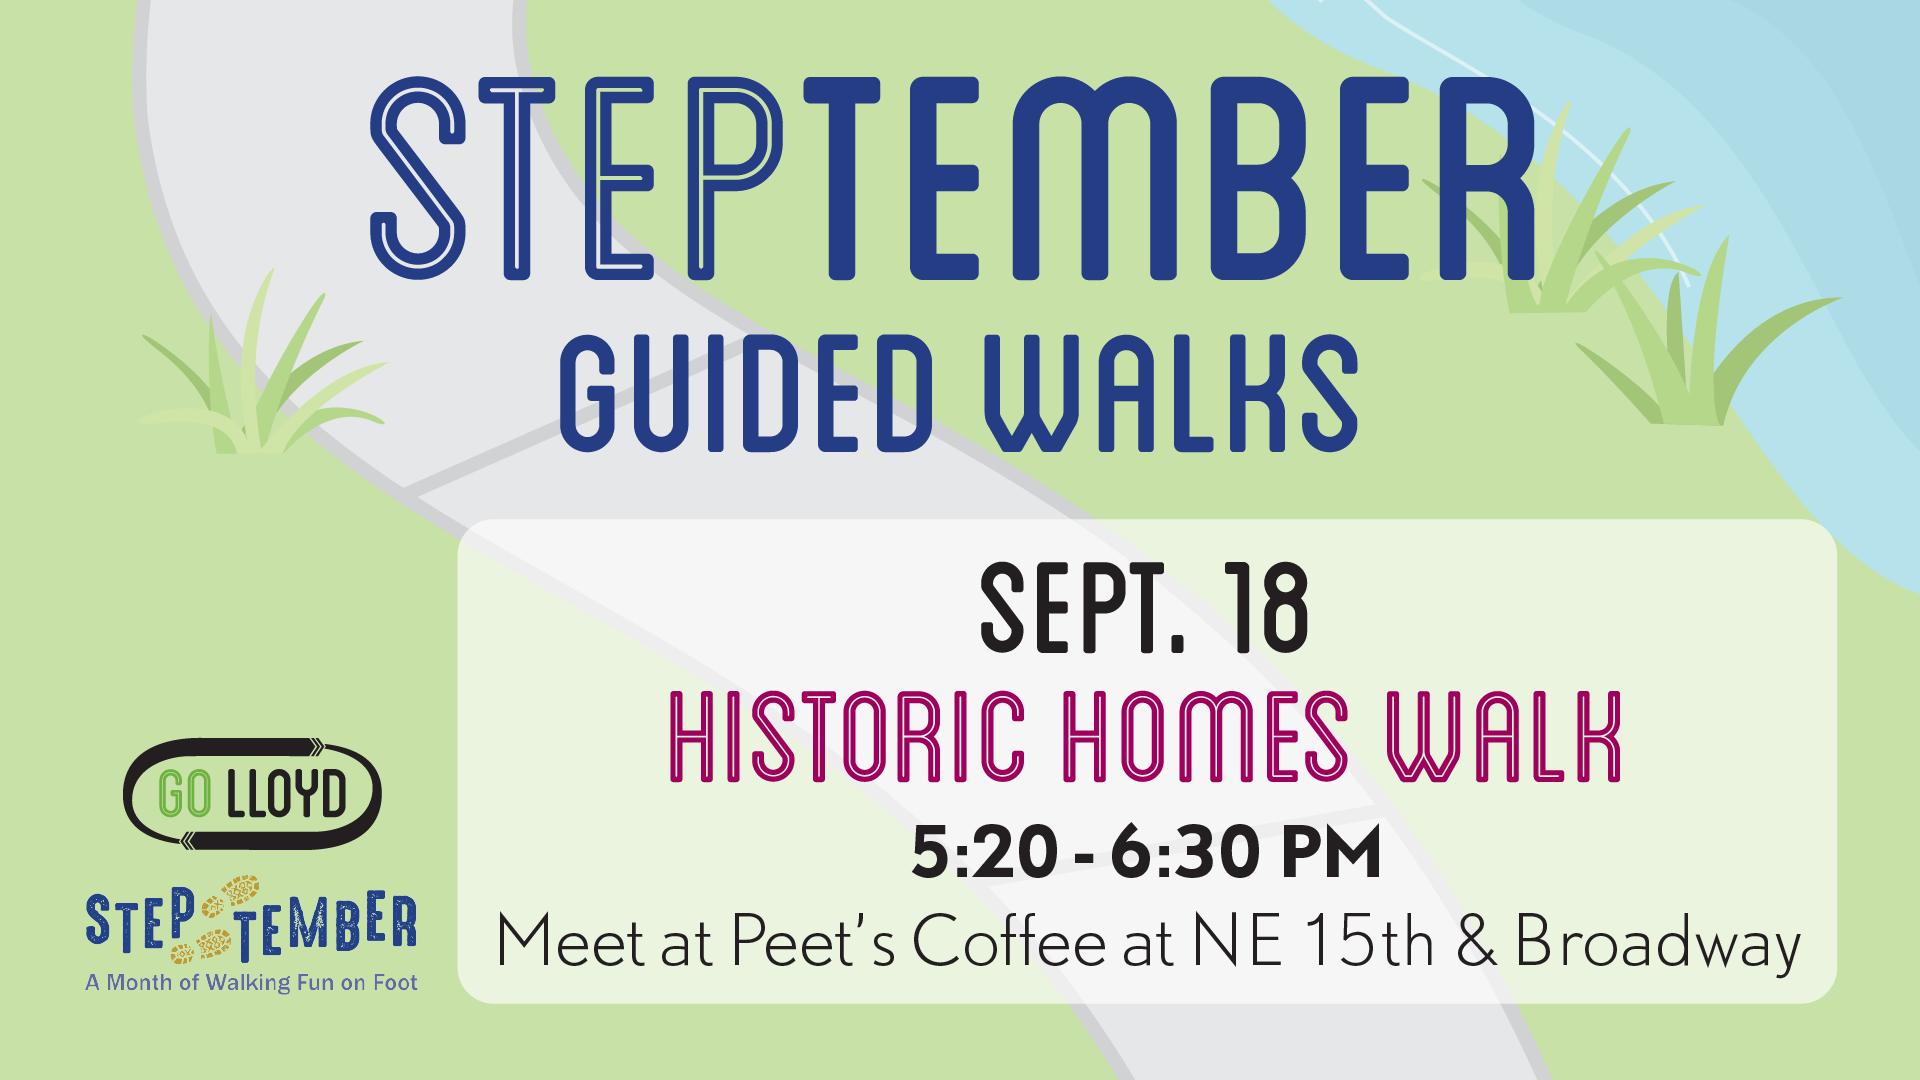 2019-09-18 STEPtember Walk Homes Social.png